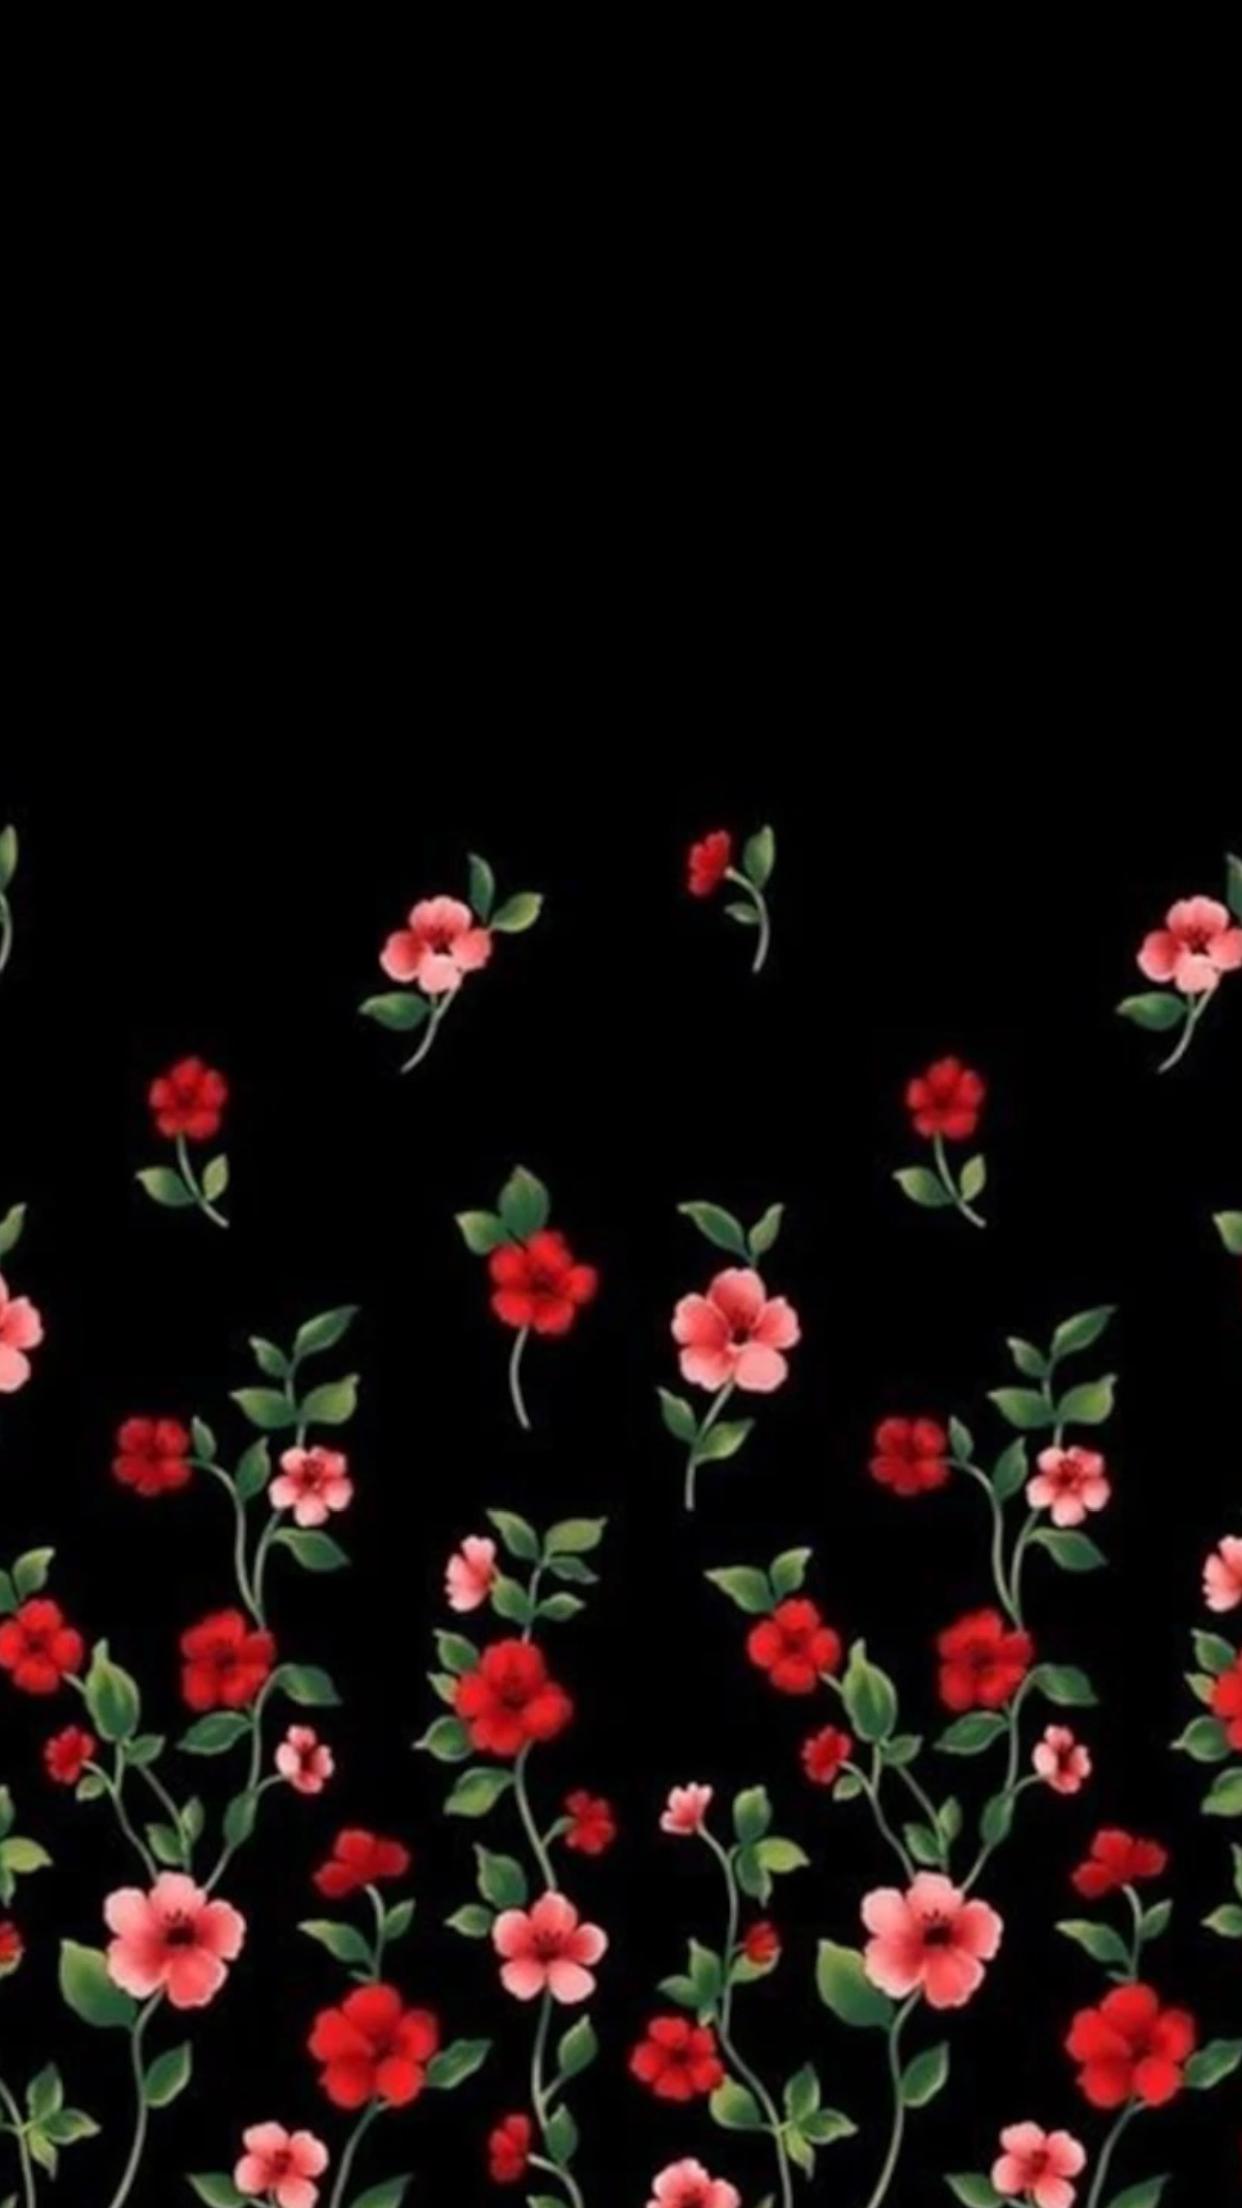 Flower wallpaper Papeis de parede para iphone, Planos de